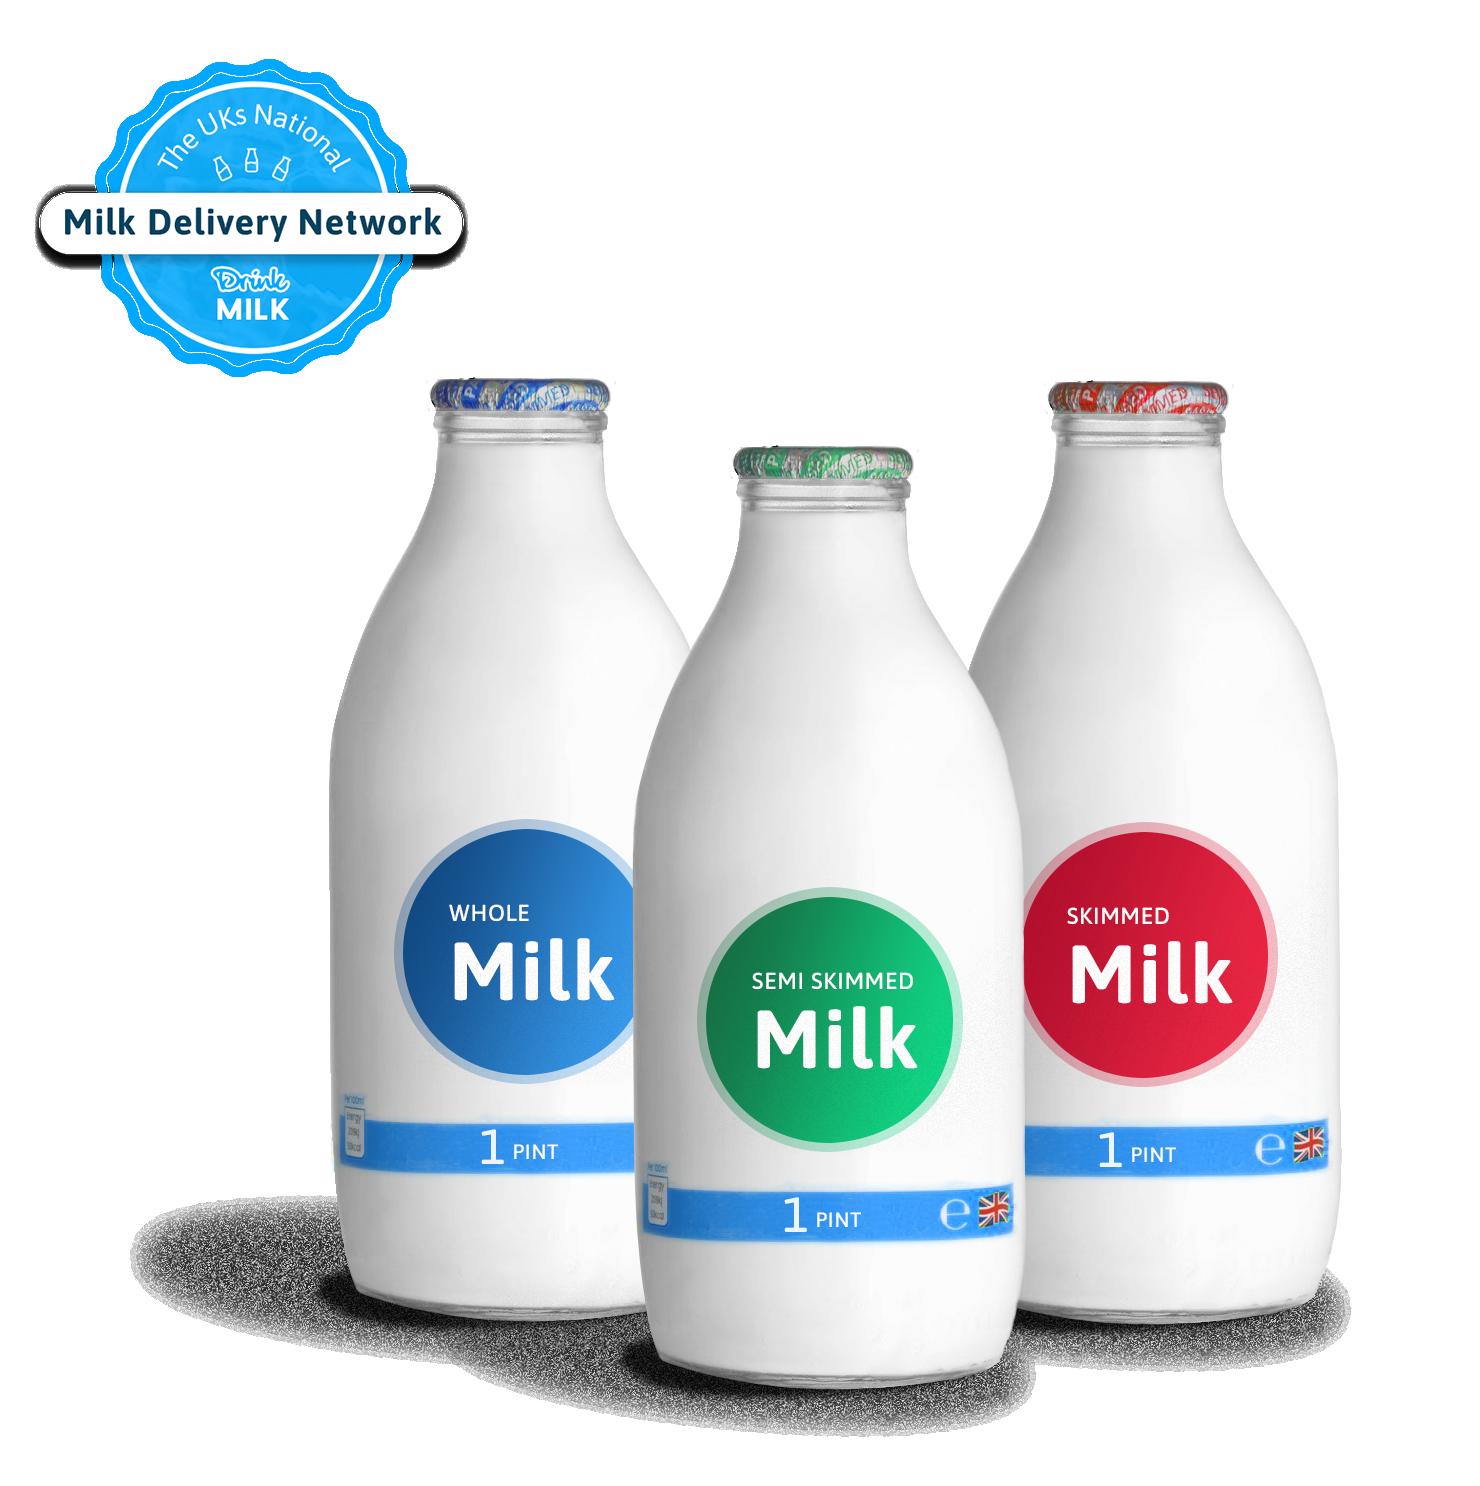 Pints of milk in glass